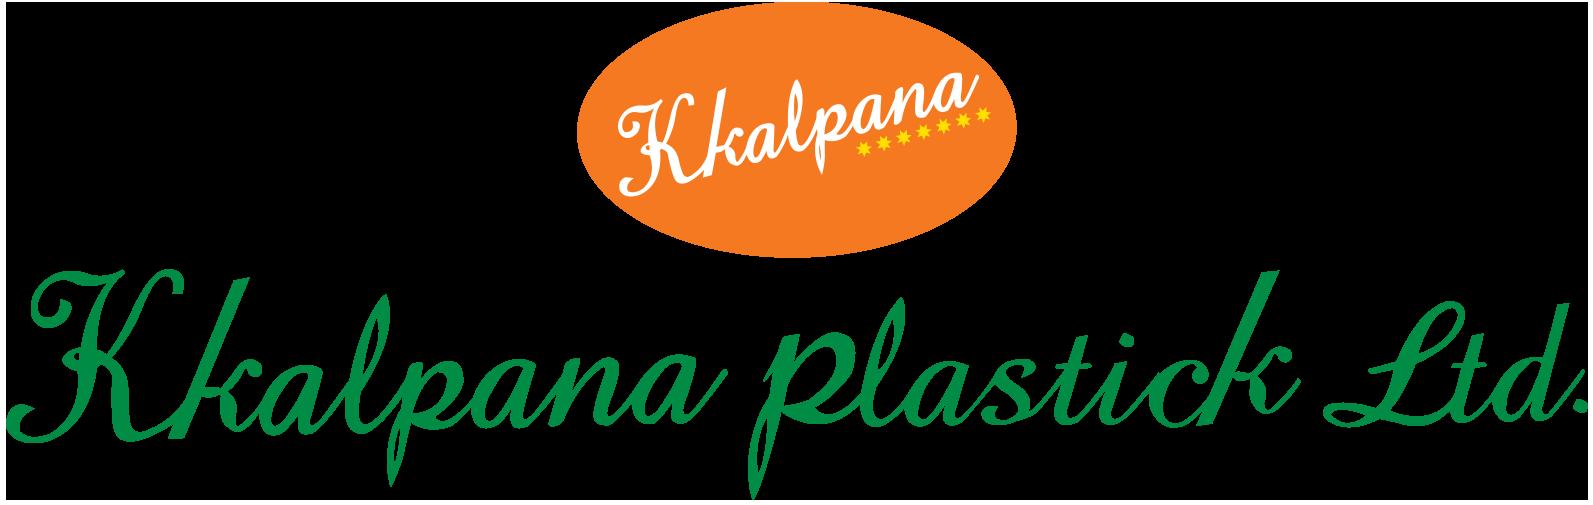 kkalpanaplastick.com